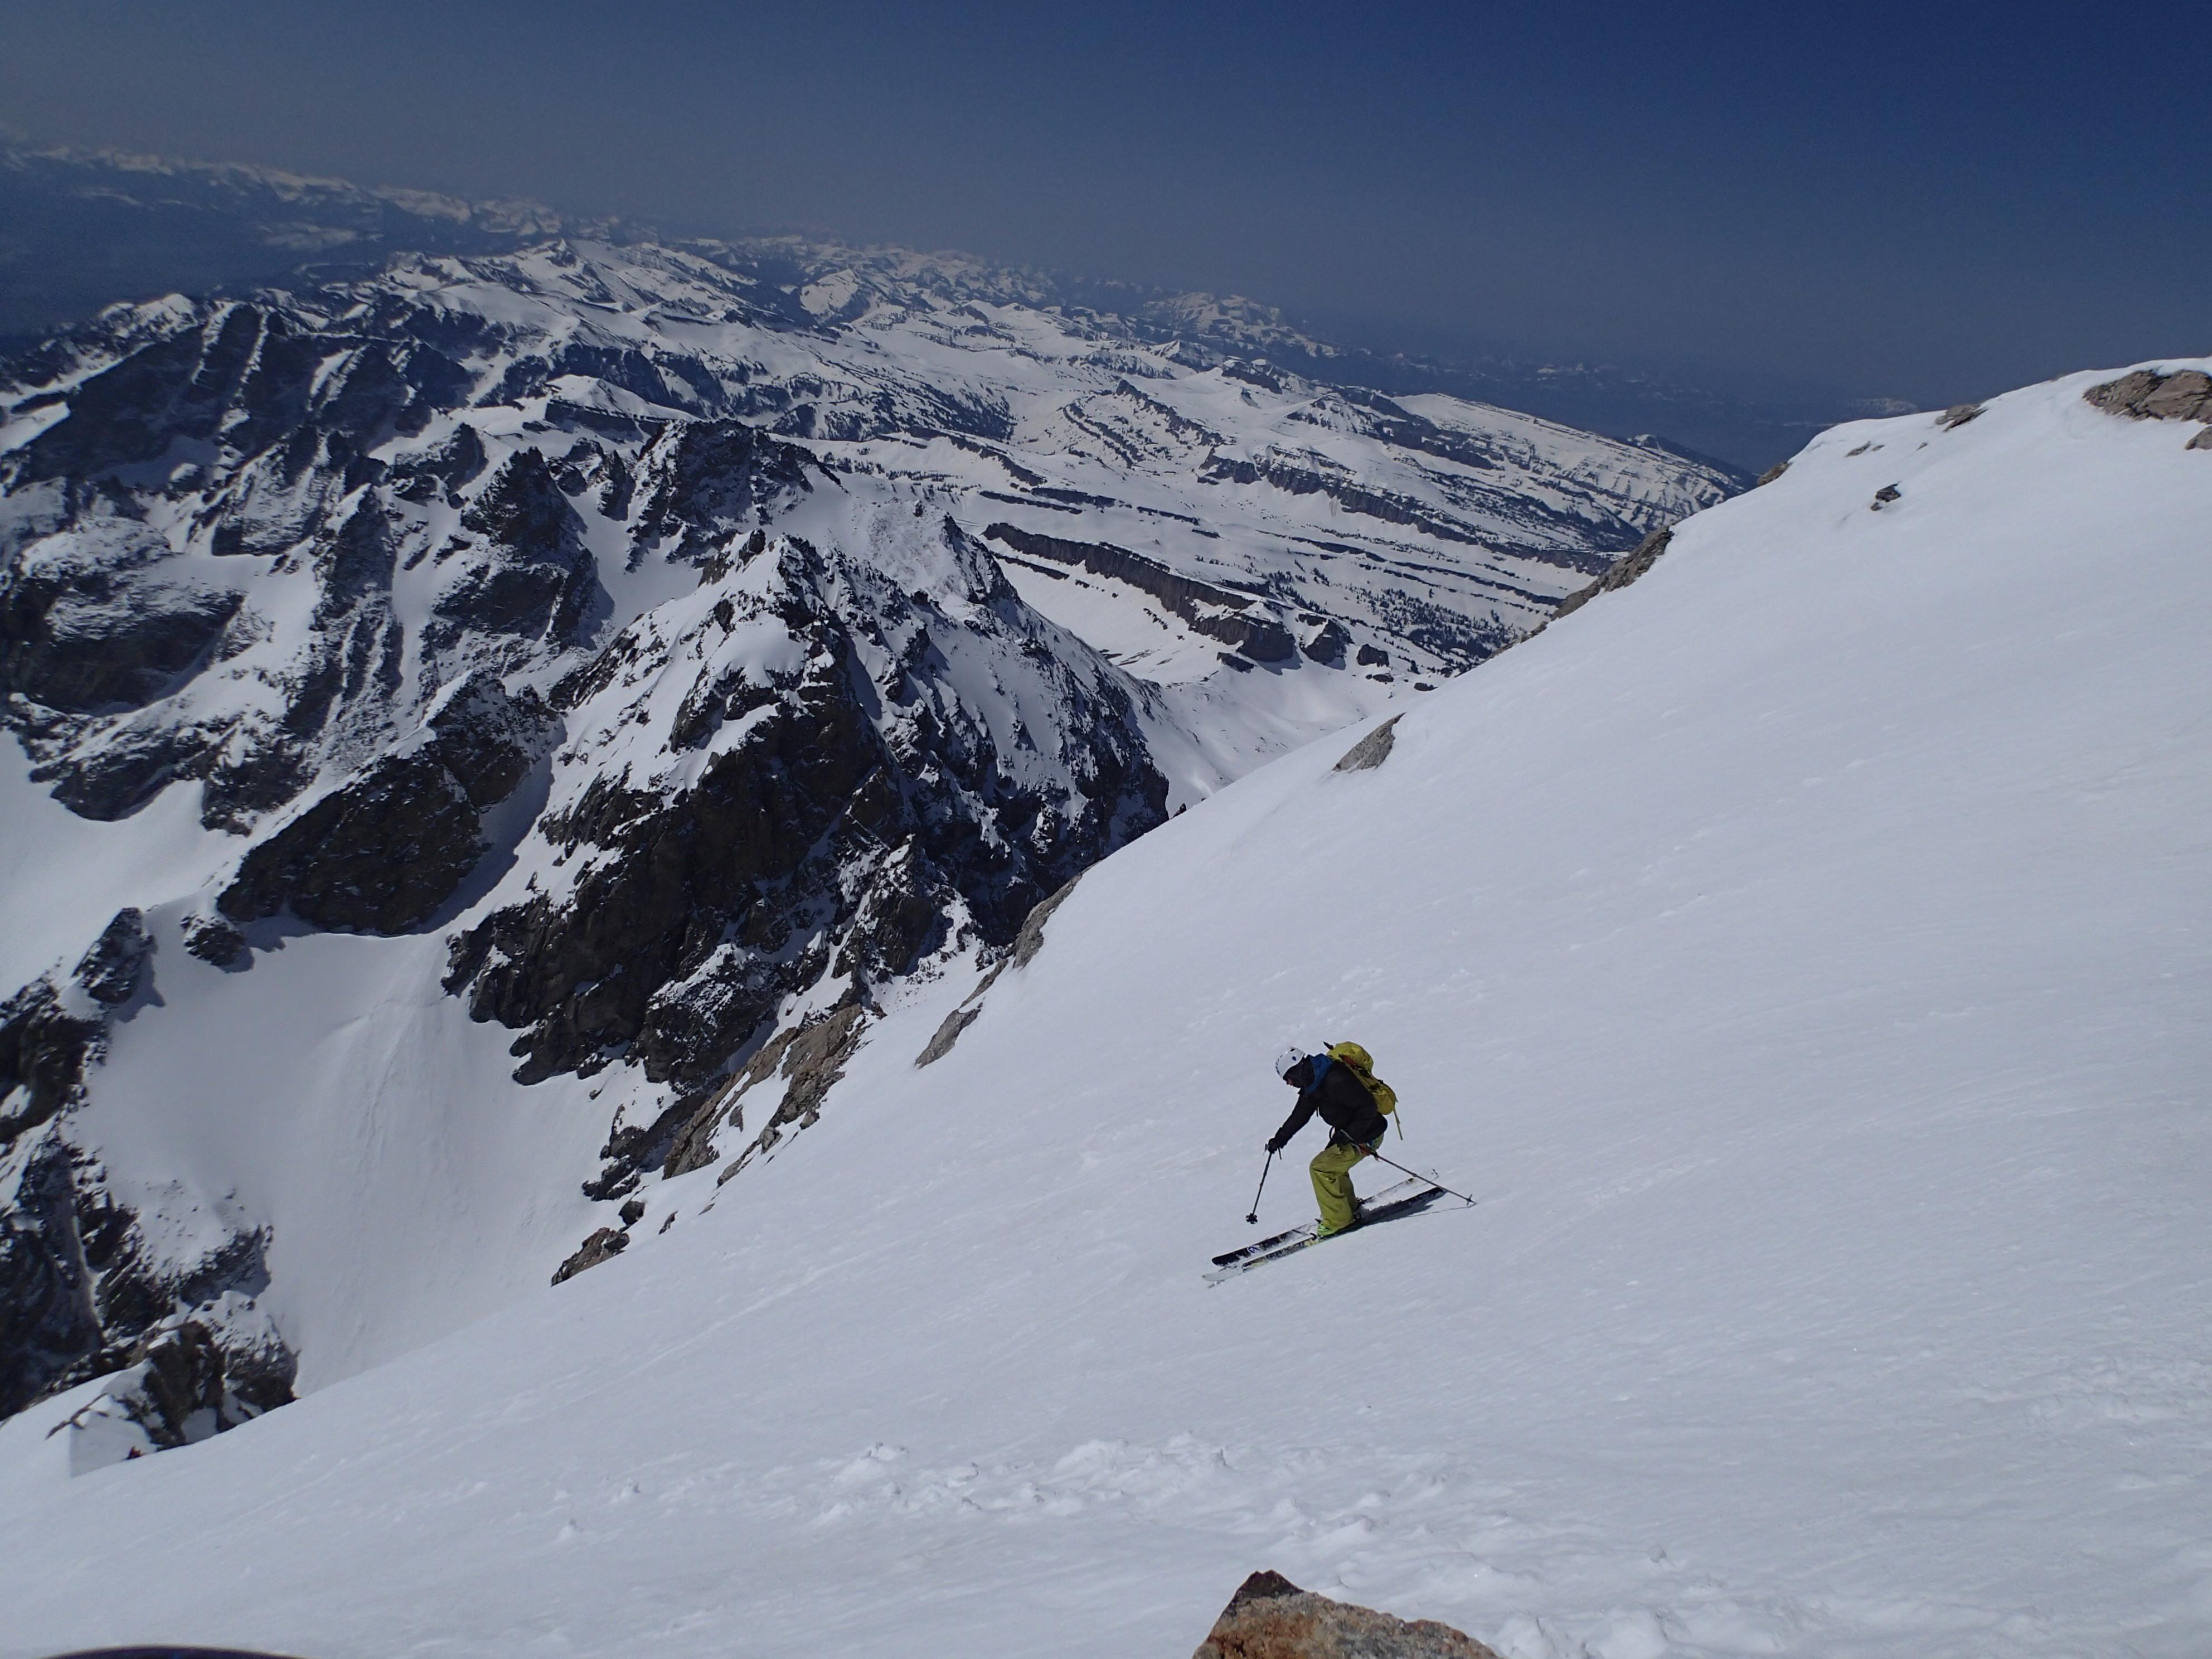 Skiing down the Grand Teton